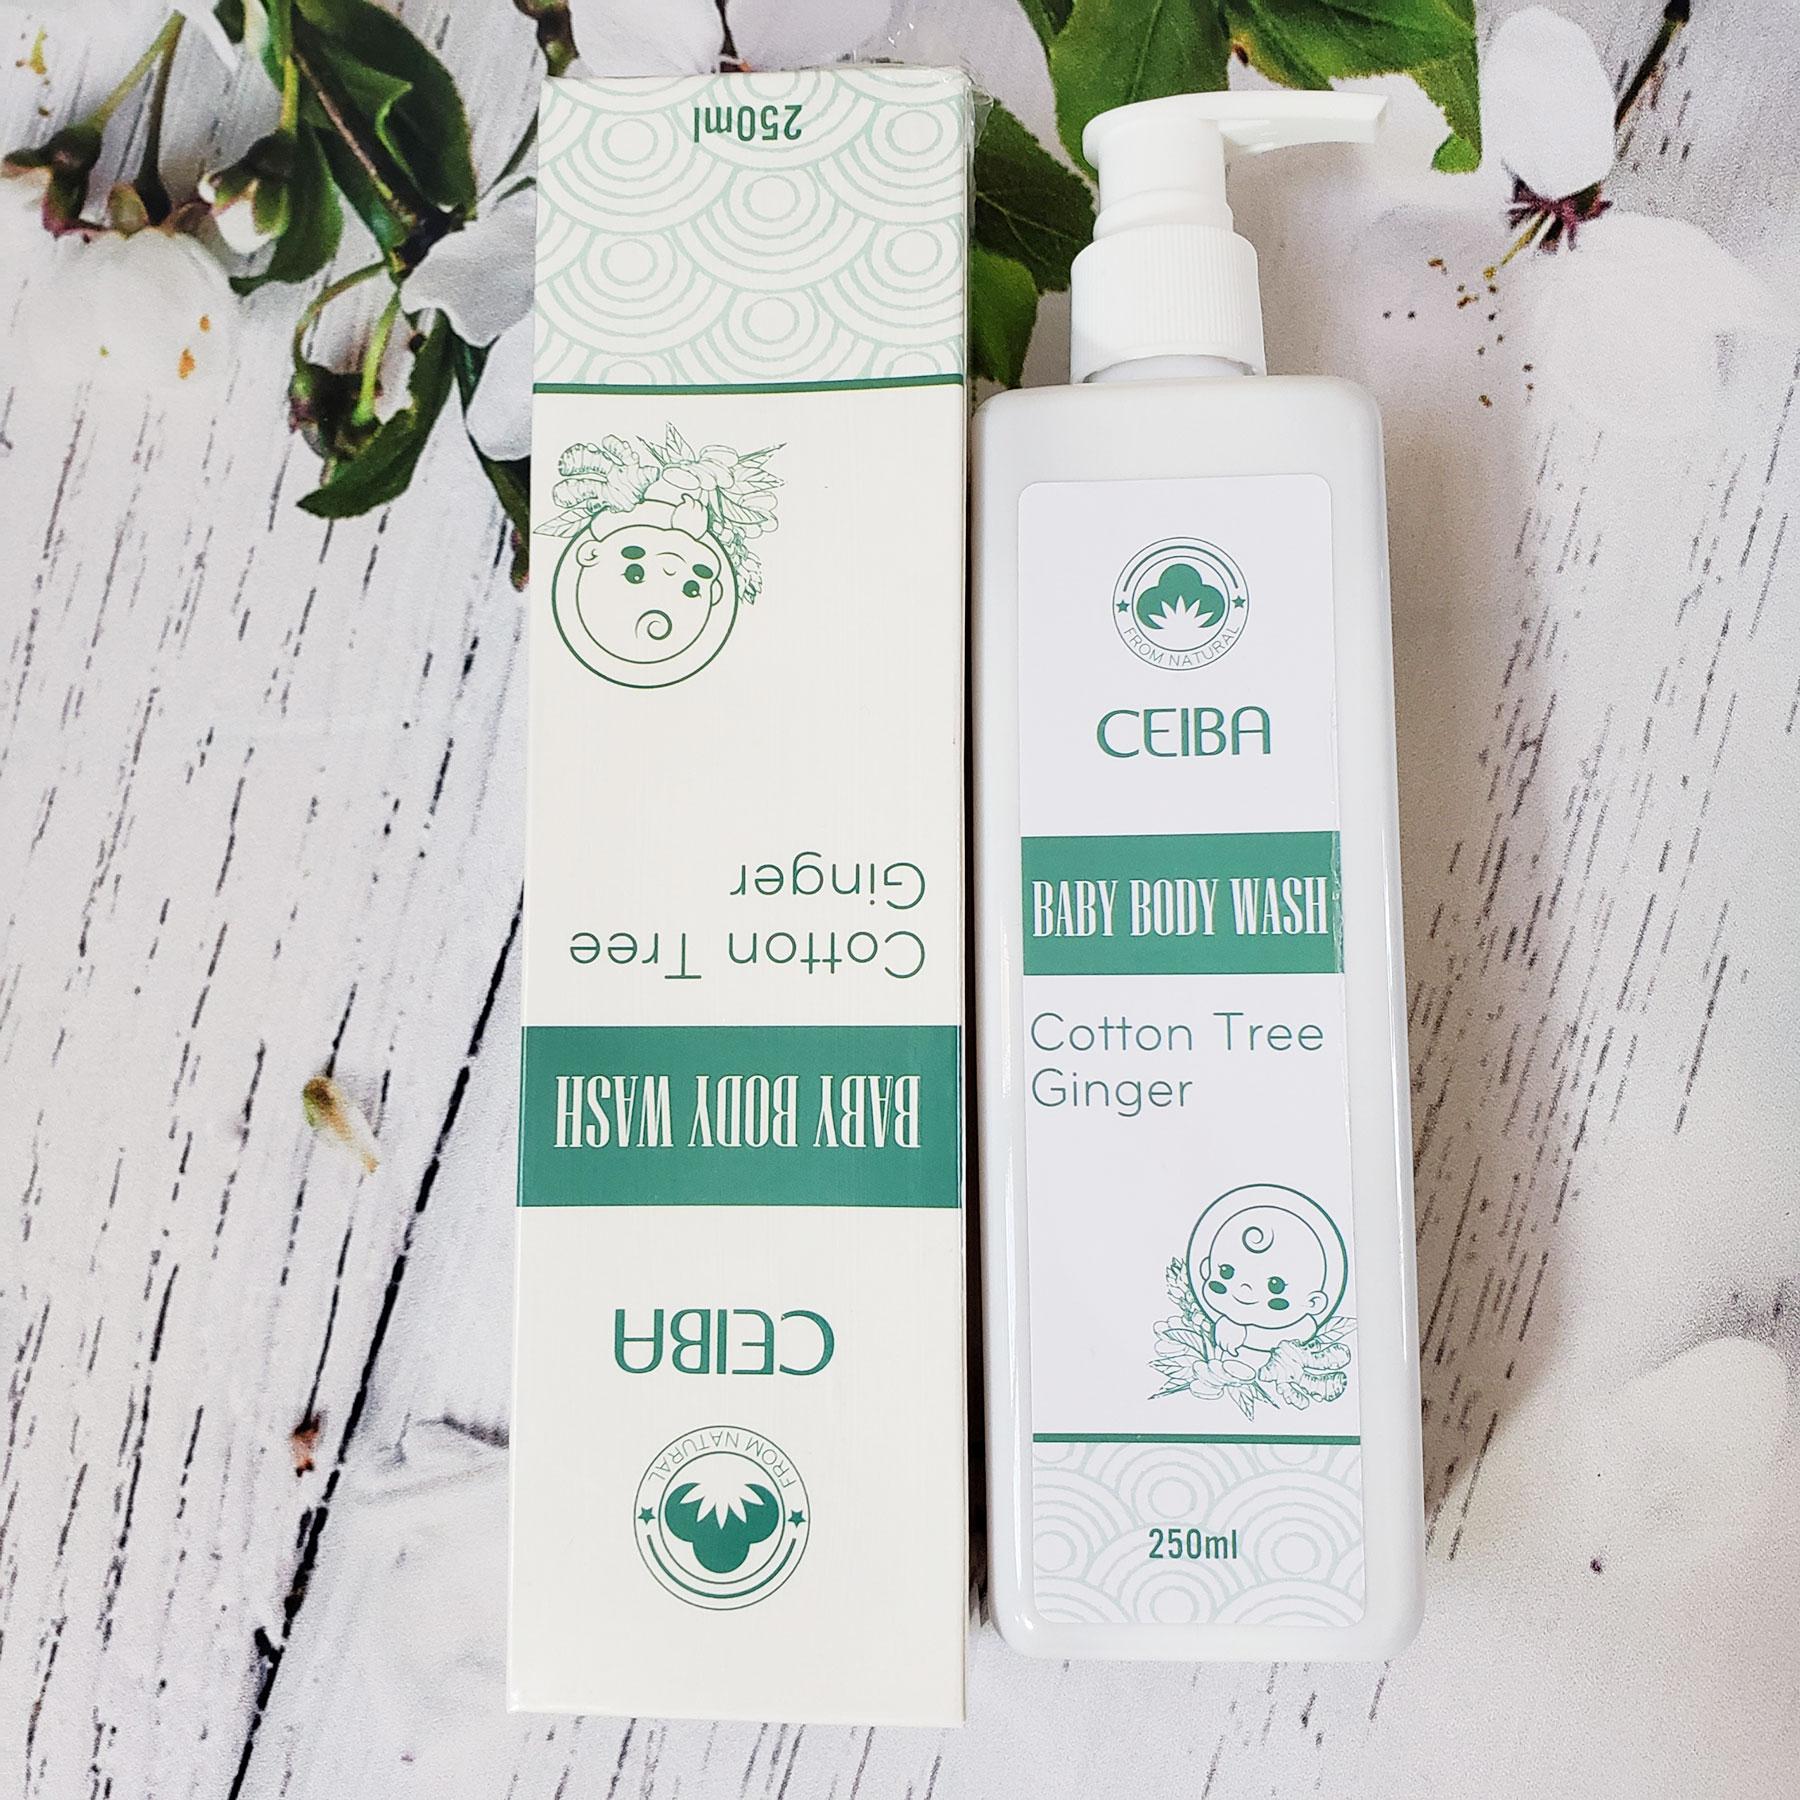 Sữa tắm tinh dầu gừng Baby Body Wash CEIBA 250ml